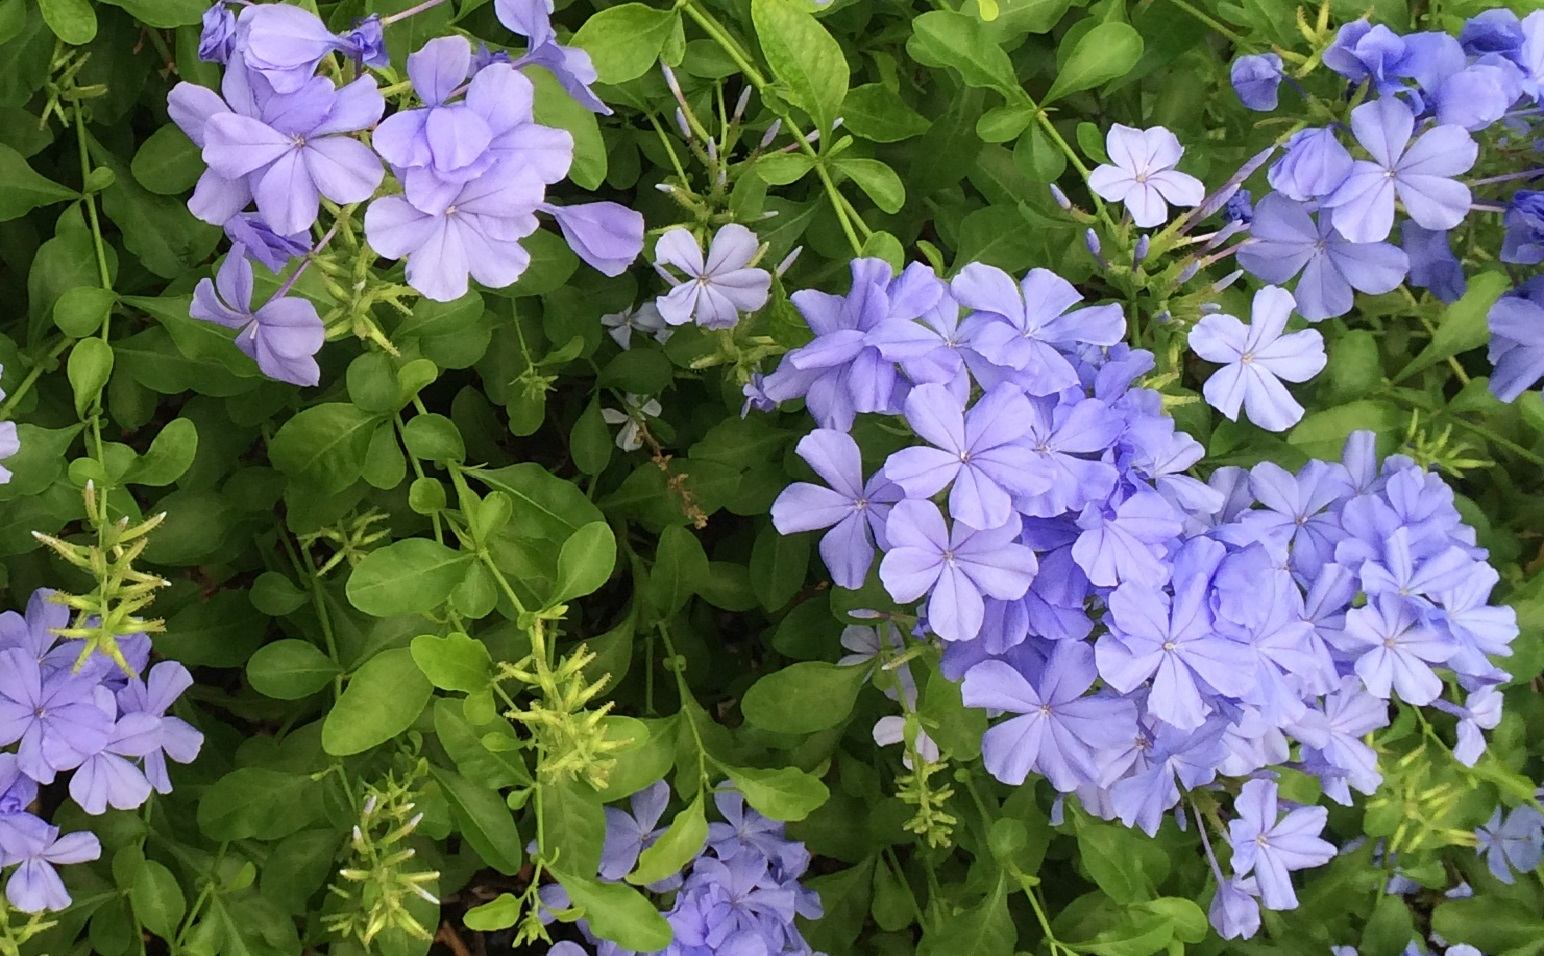 Clase de flores y sus nombres clase de flores y sus - Clase de flores y sus nombres ...